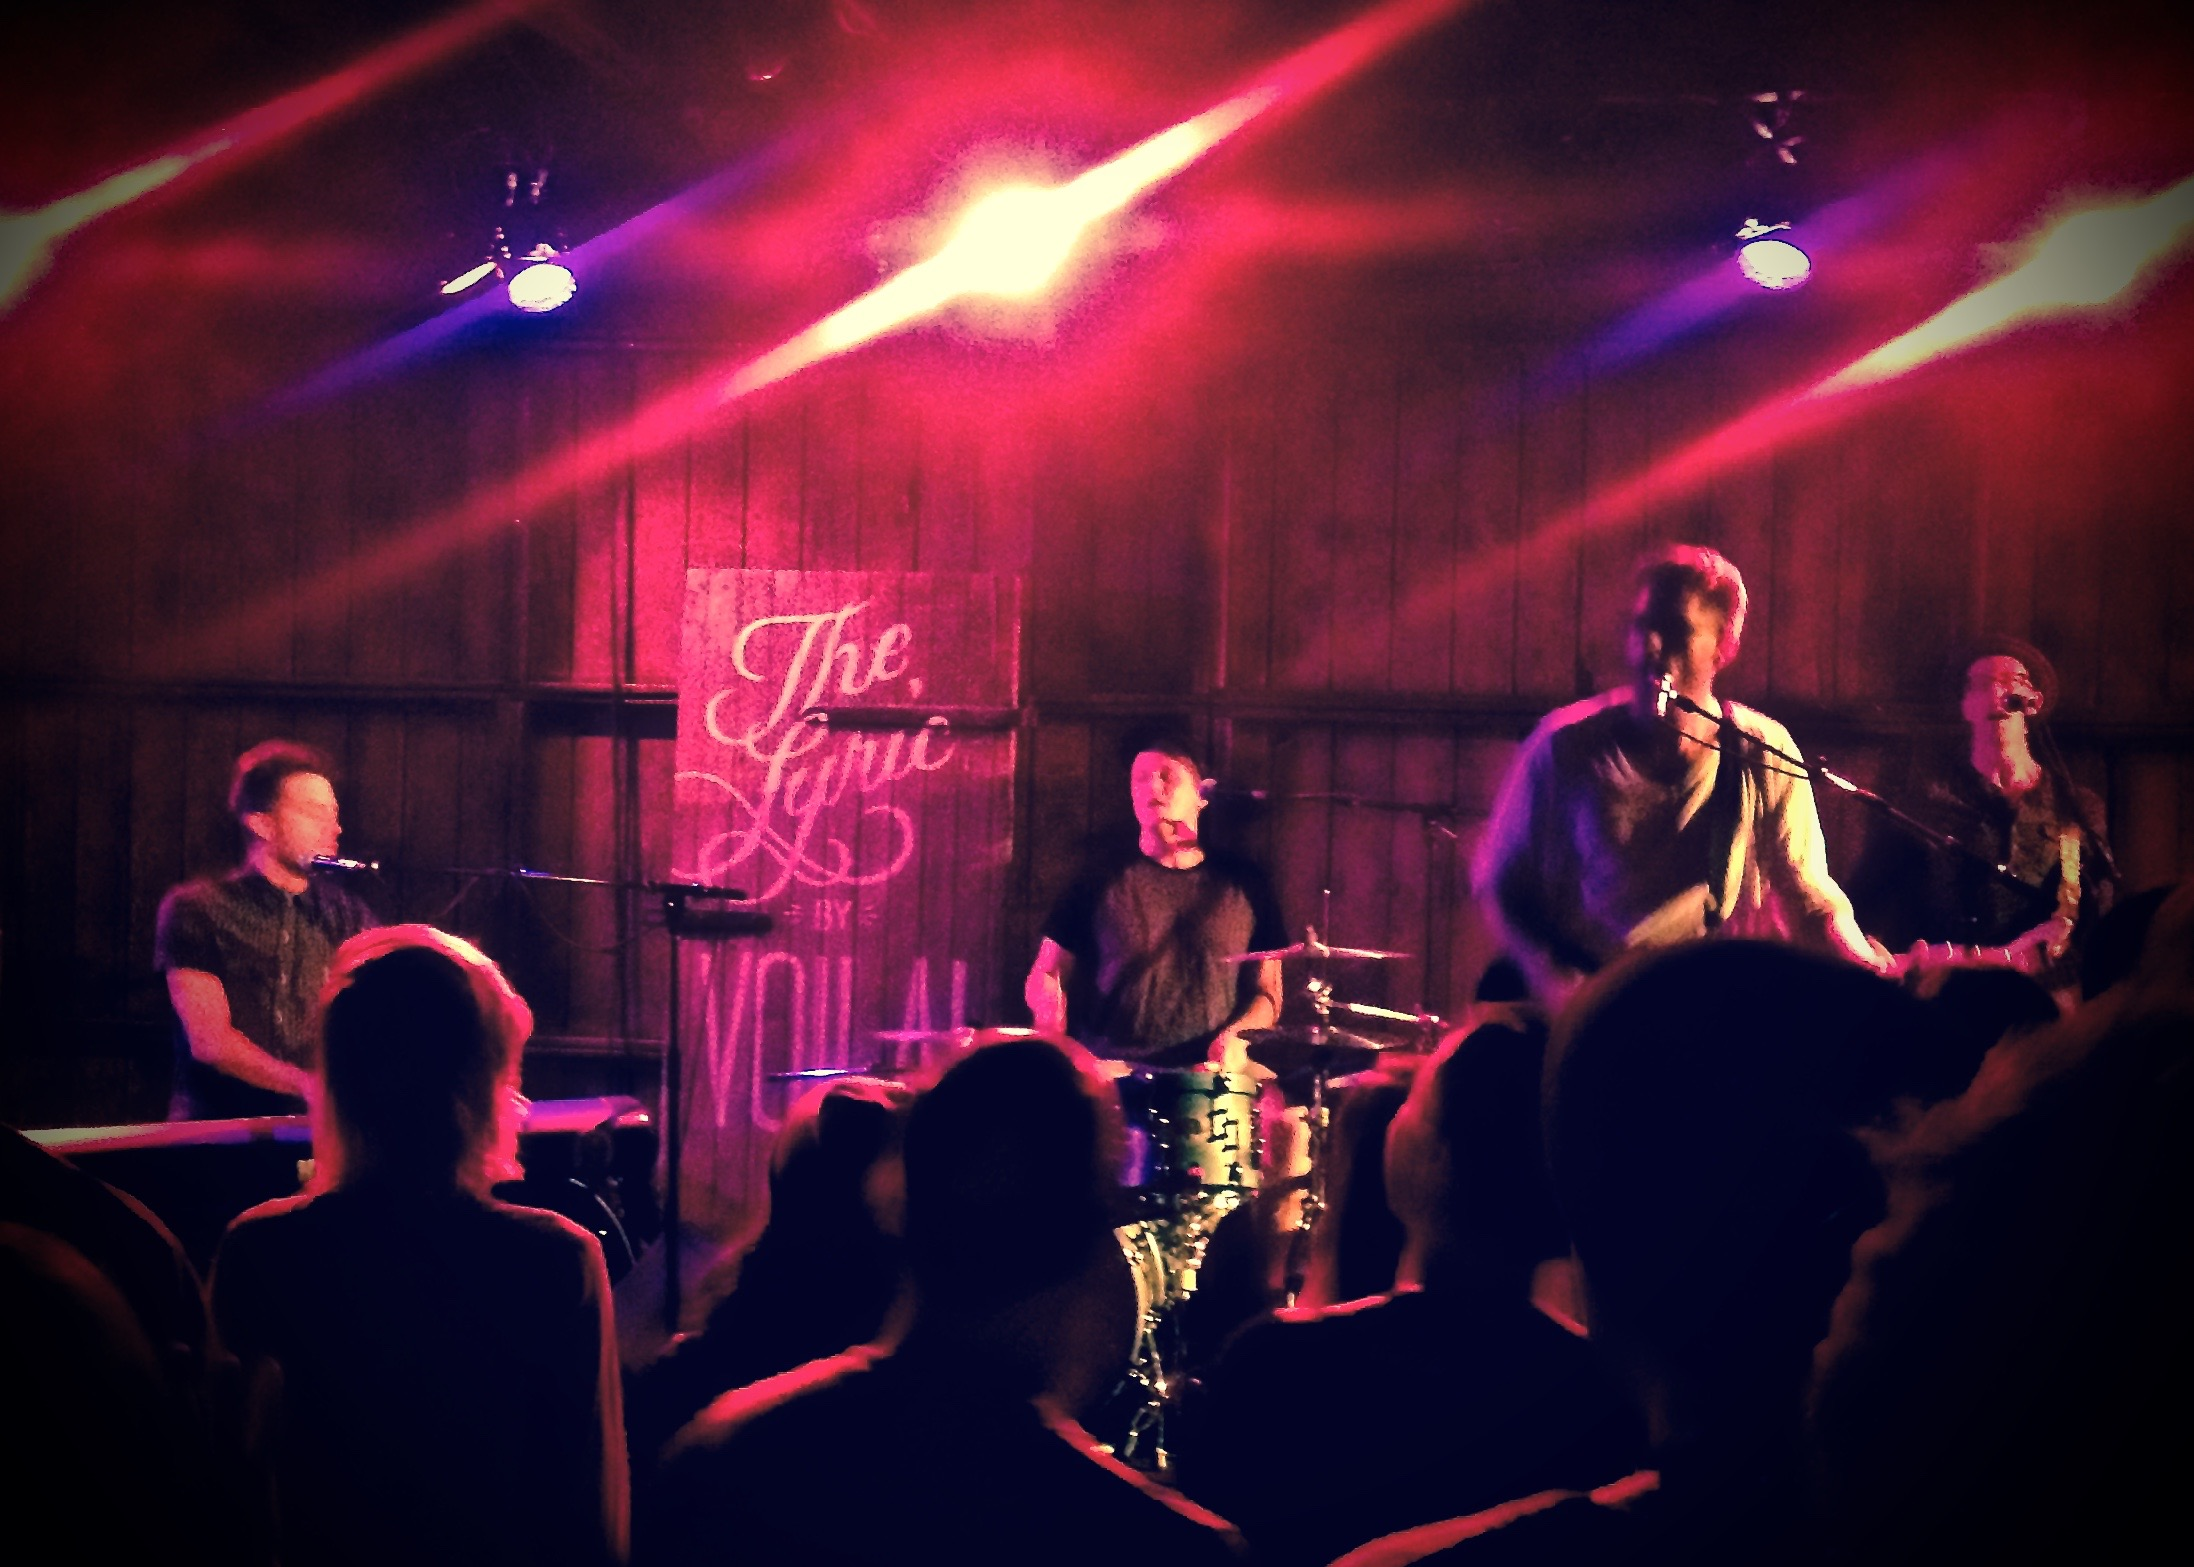 Joe Urquhart holding down the rhythm section on tour with Recording Artist Brendan James.